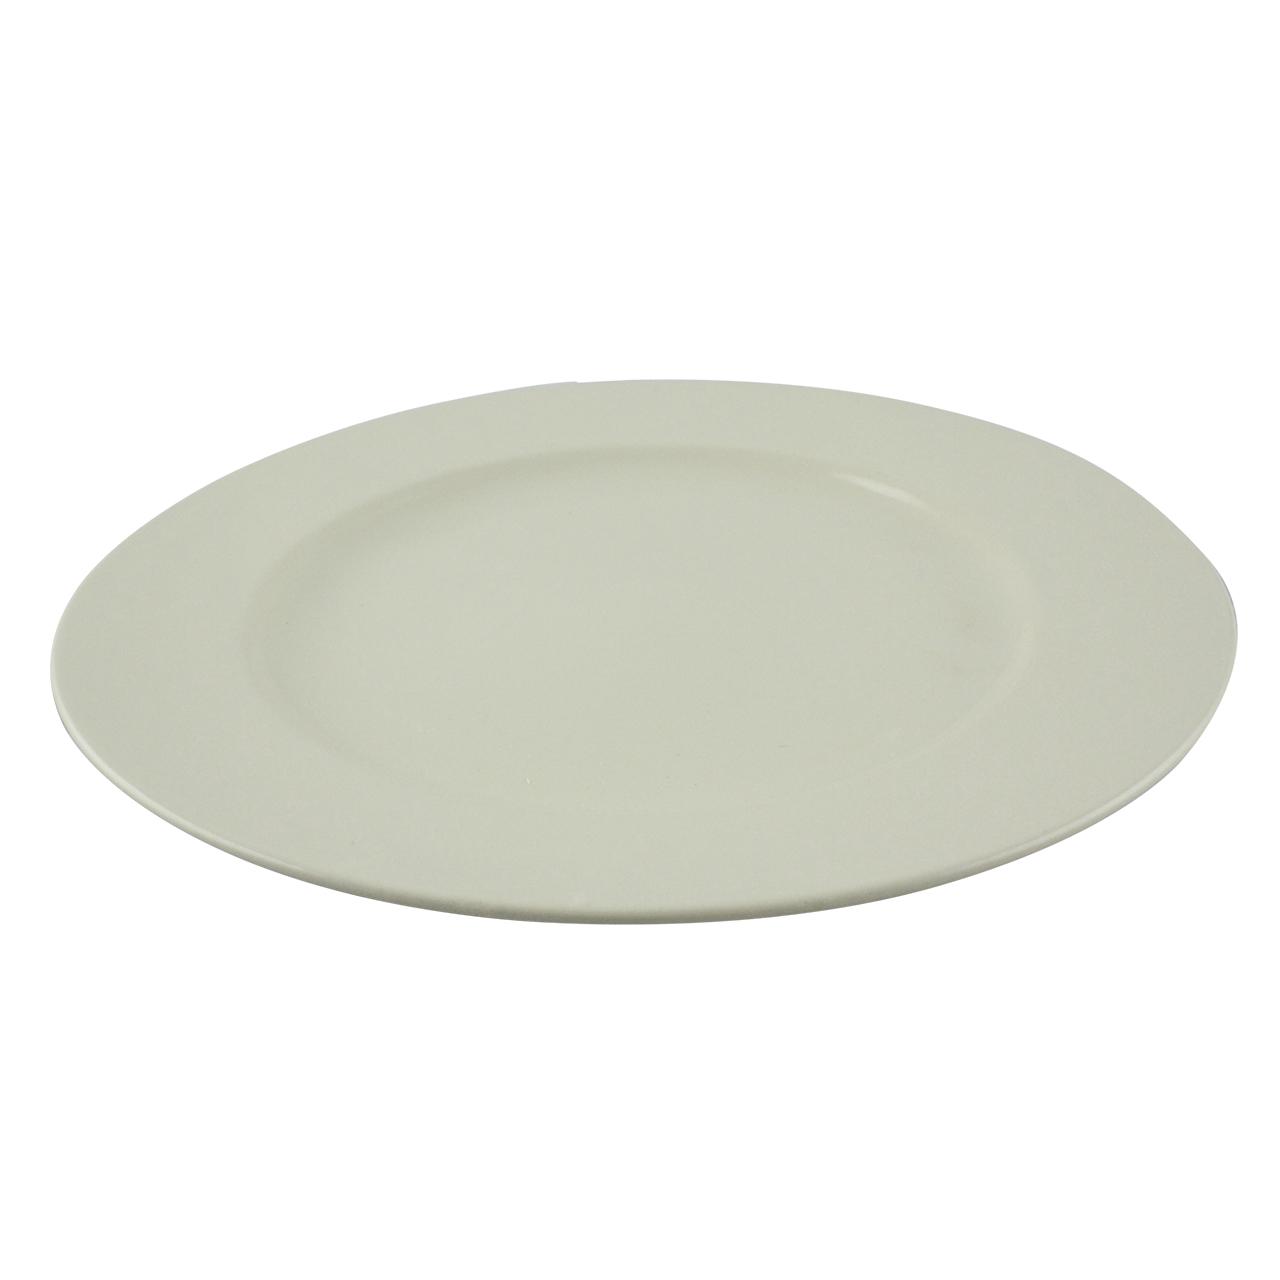 Platou Din Ceramica Alba 30 Cm